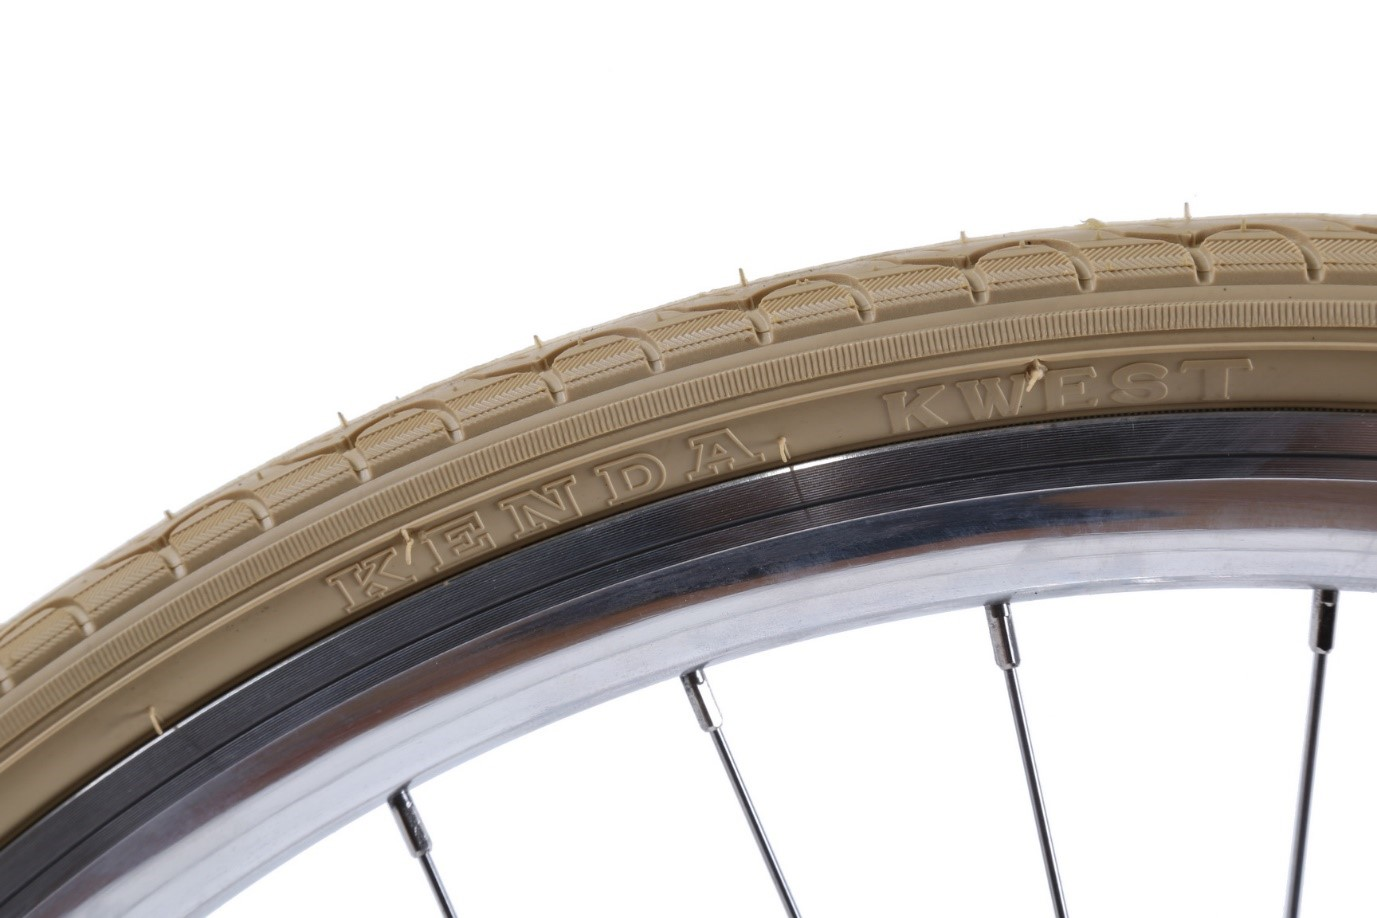 https://nixeycles.com.au/Site/wp-content/uploads/2019/05/nixeycles-kenda-kwest-tyres.jpg